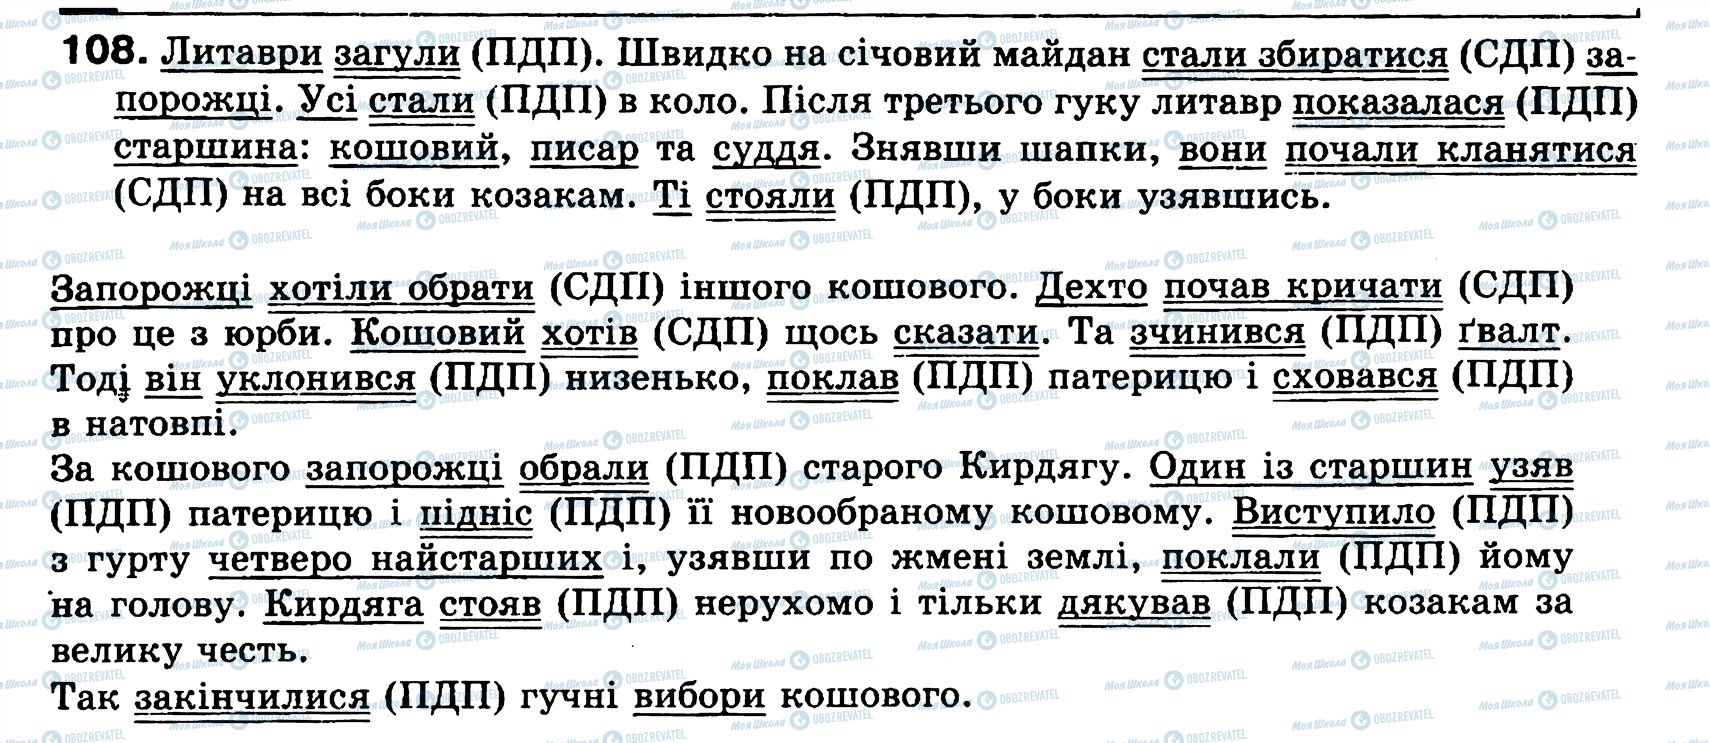 ГДЗ Укр мова 8 класс страница 108